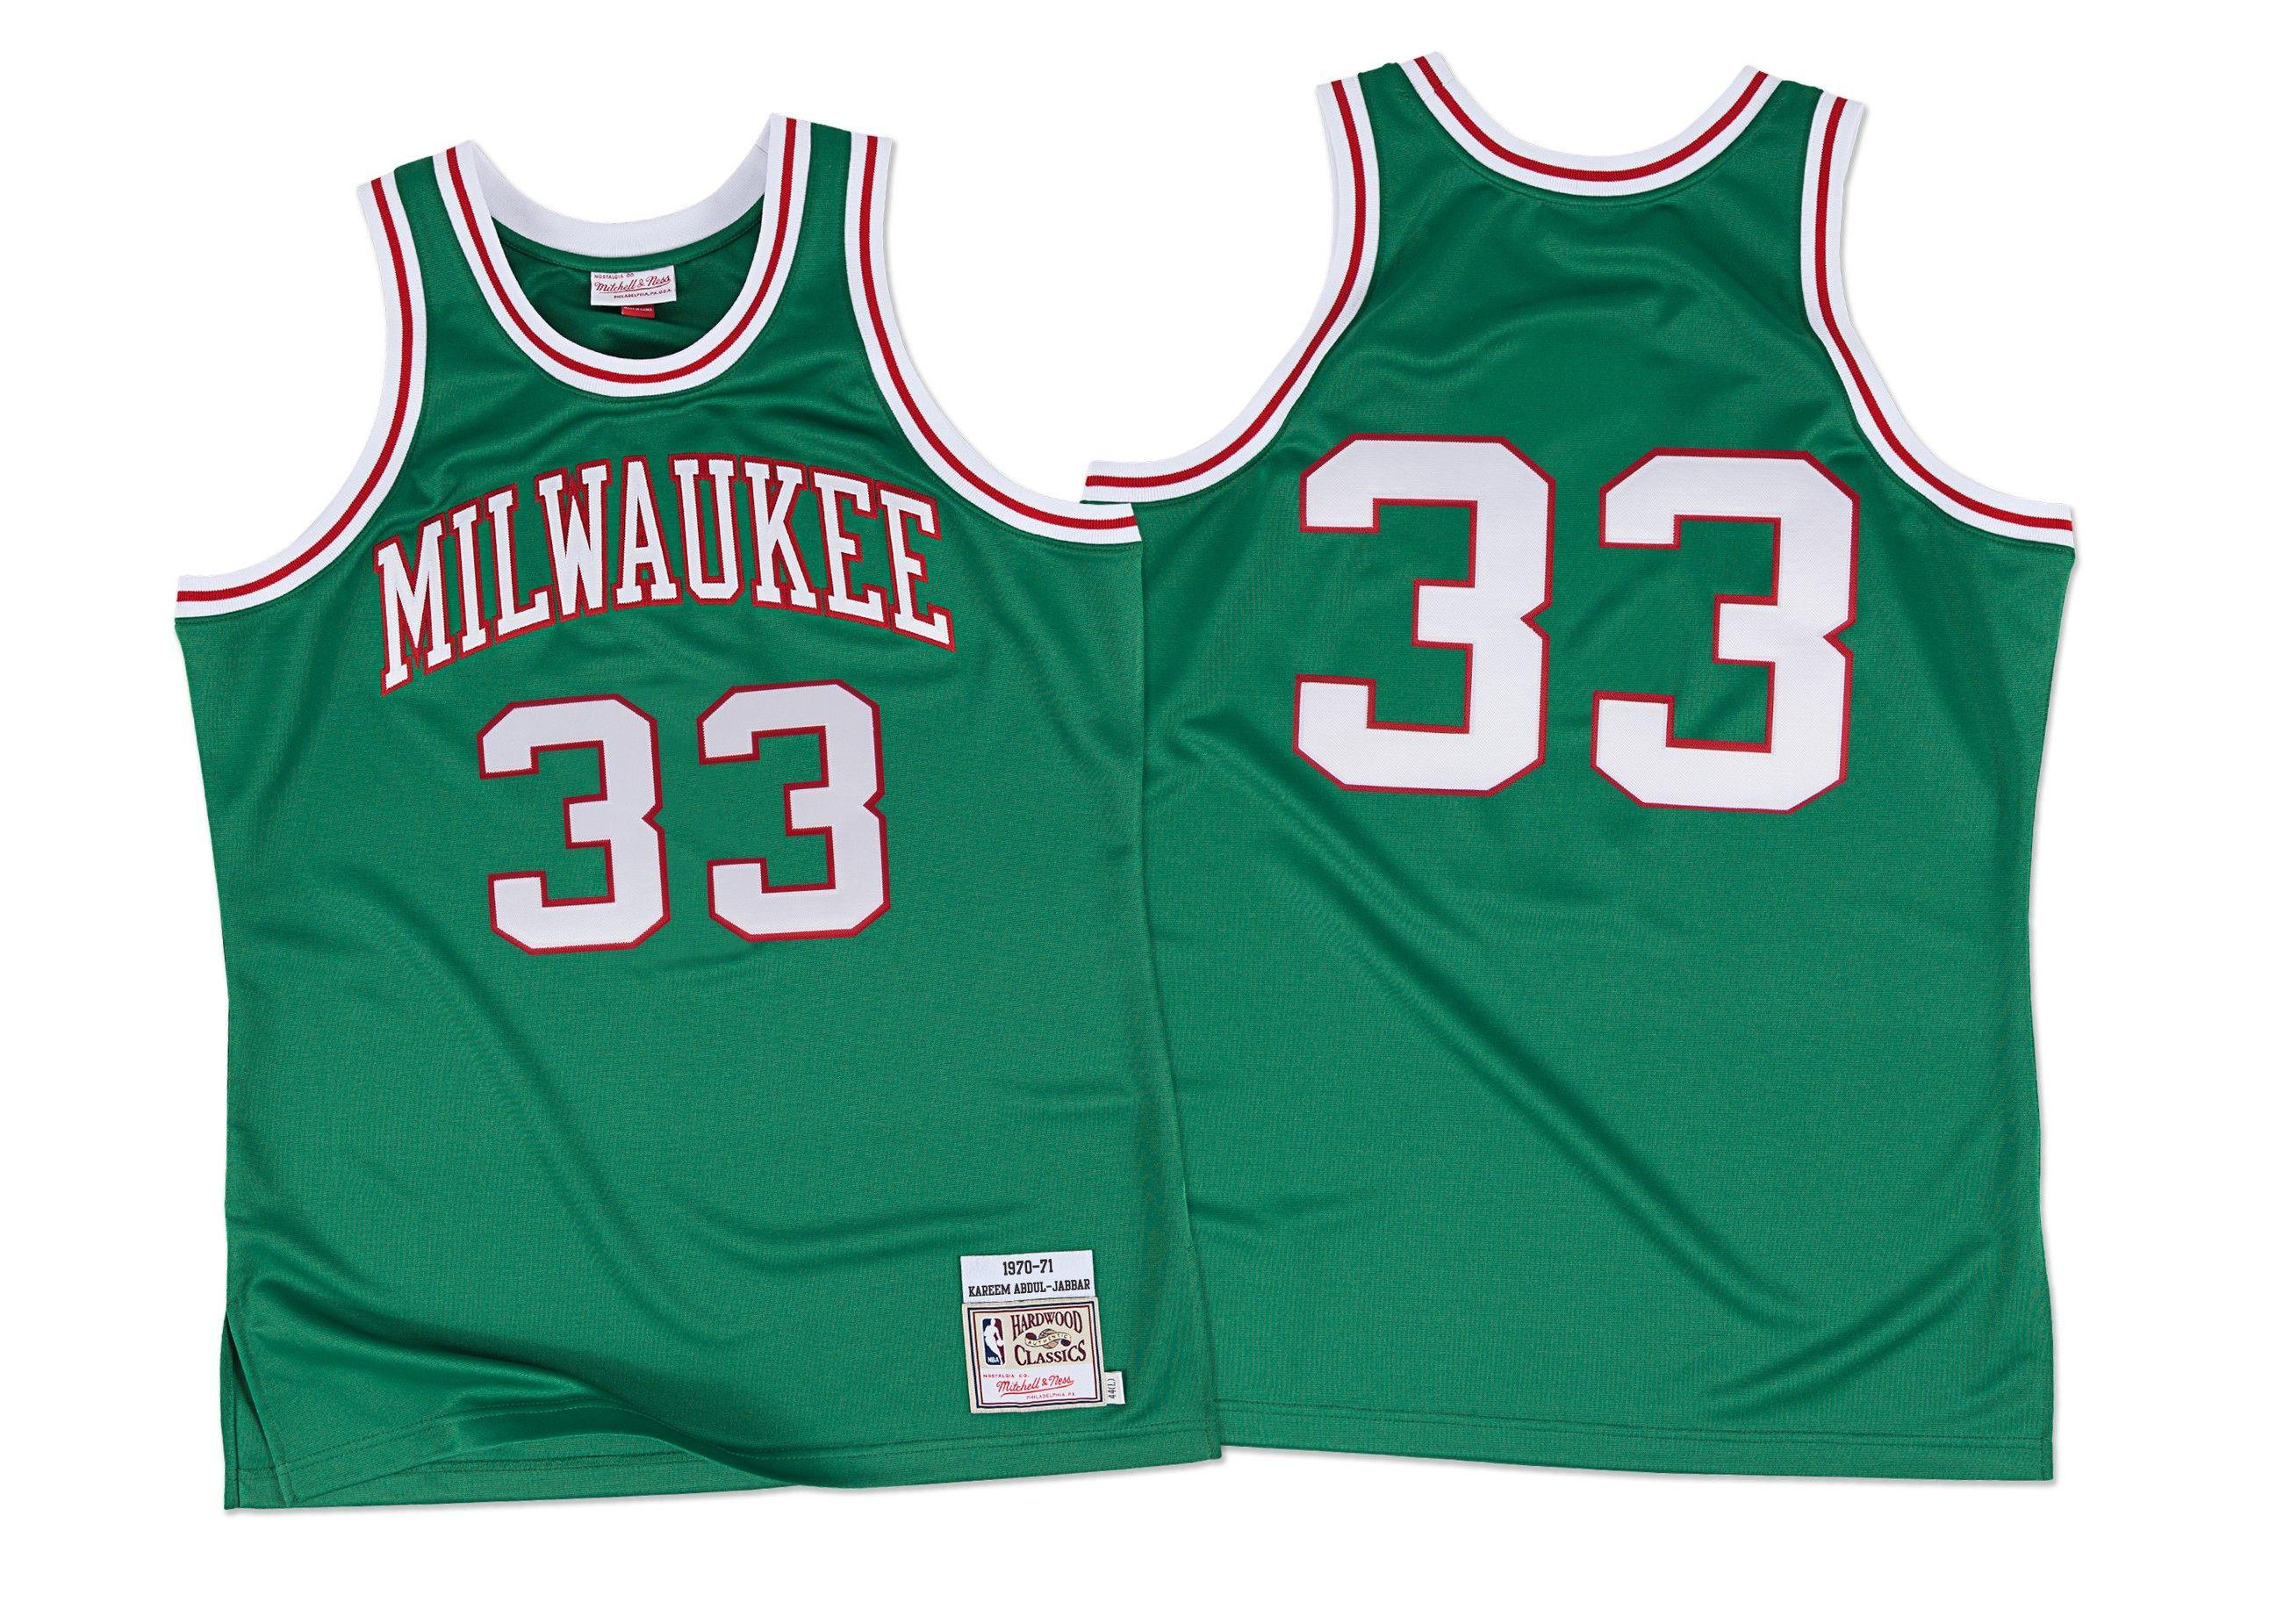 new product d14cd 7b82b Kareem Abdul-Jabbar 1970-71 Authentic Jersey Milwaukee Bucks ...